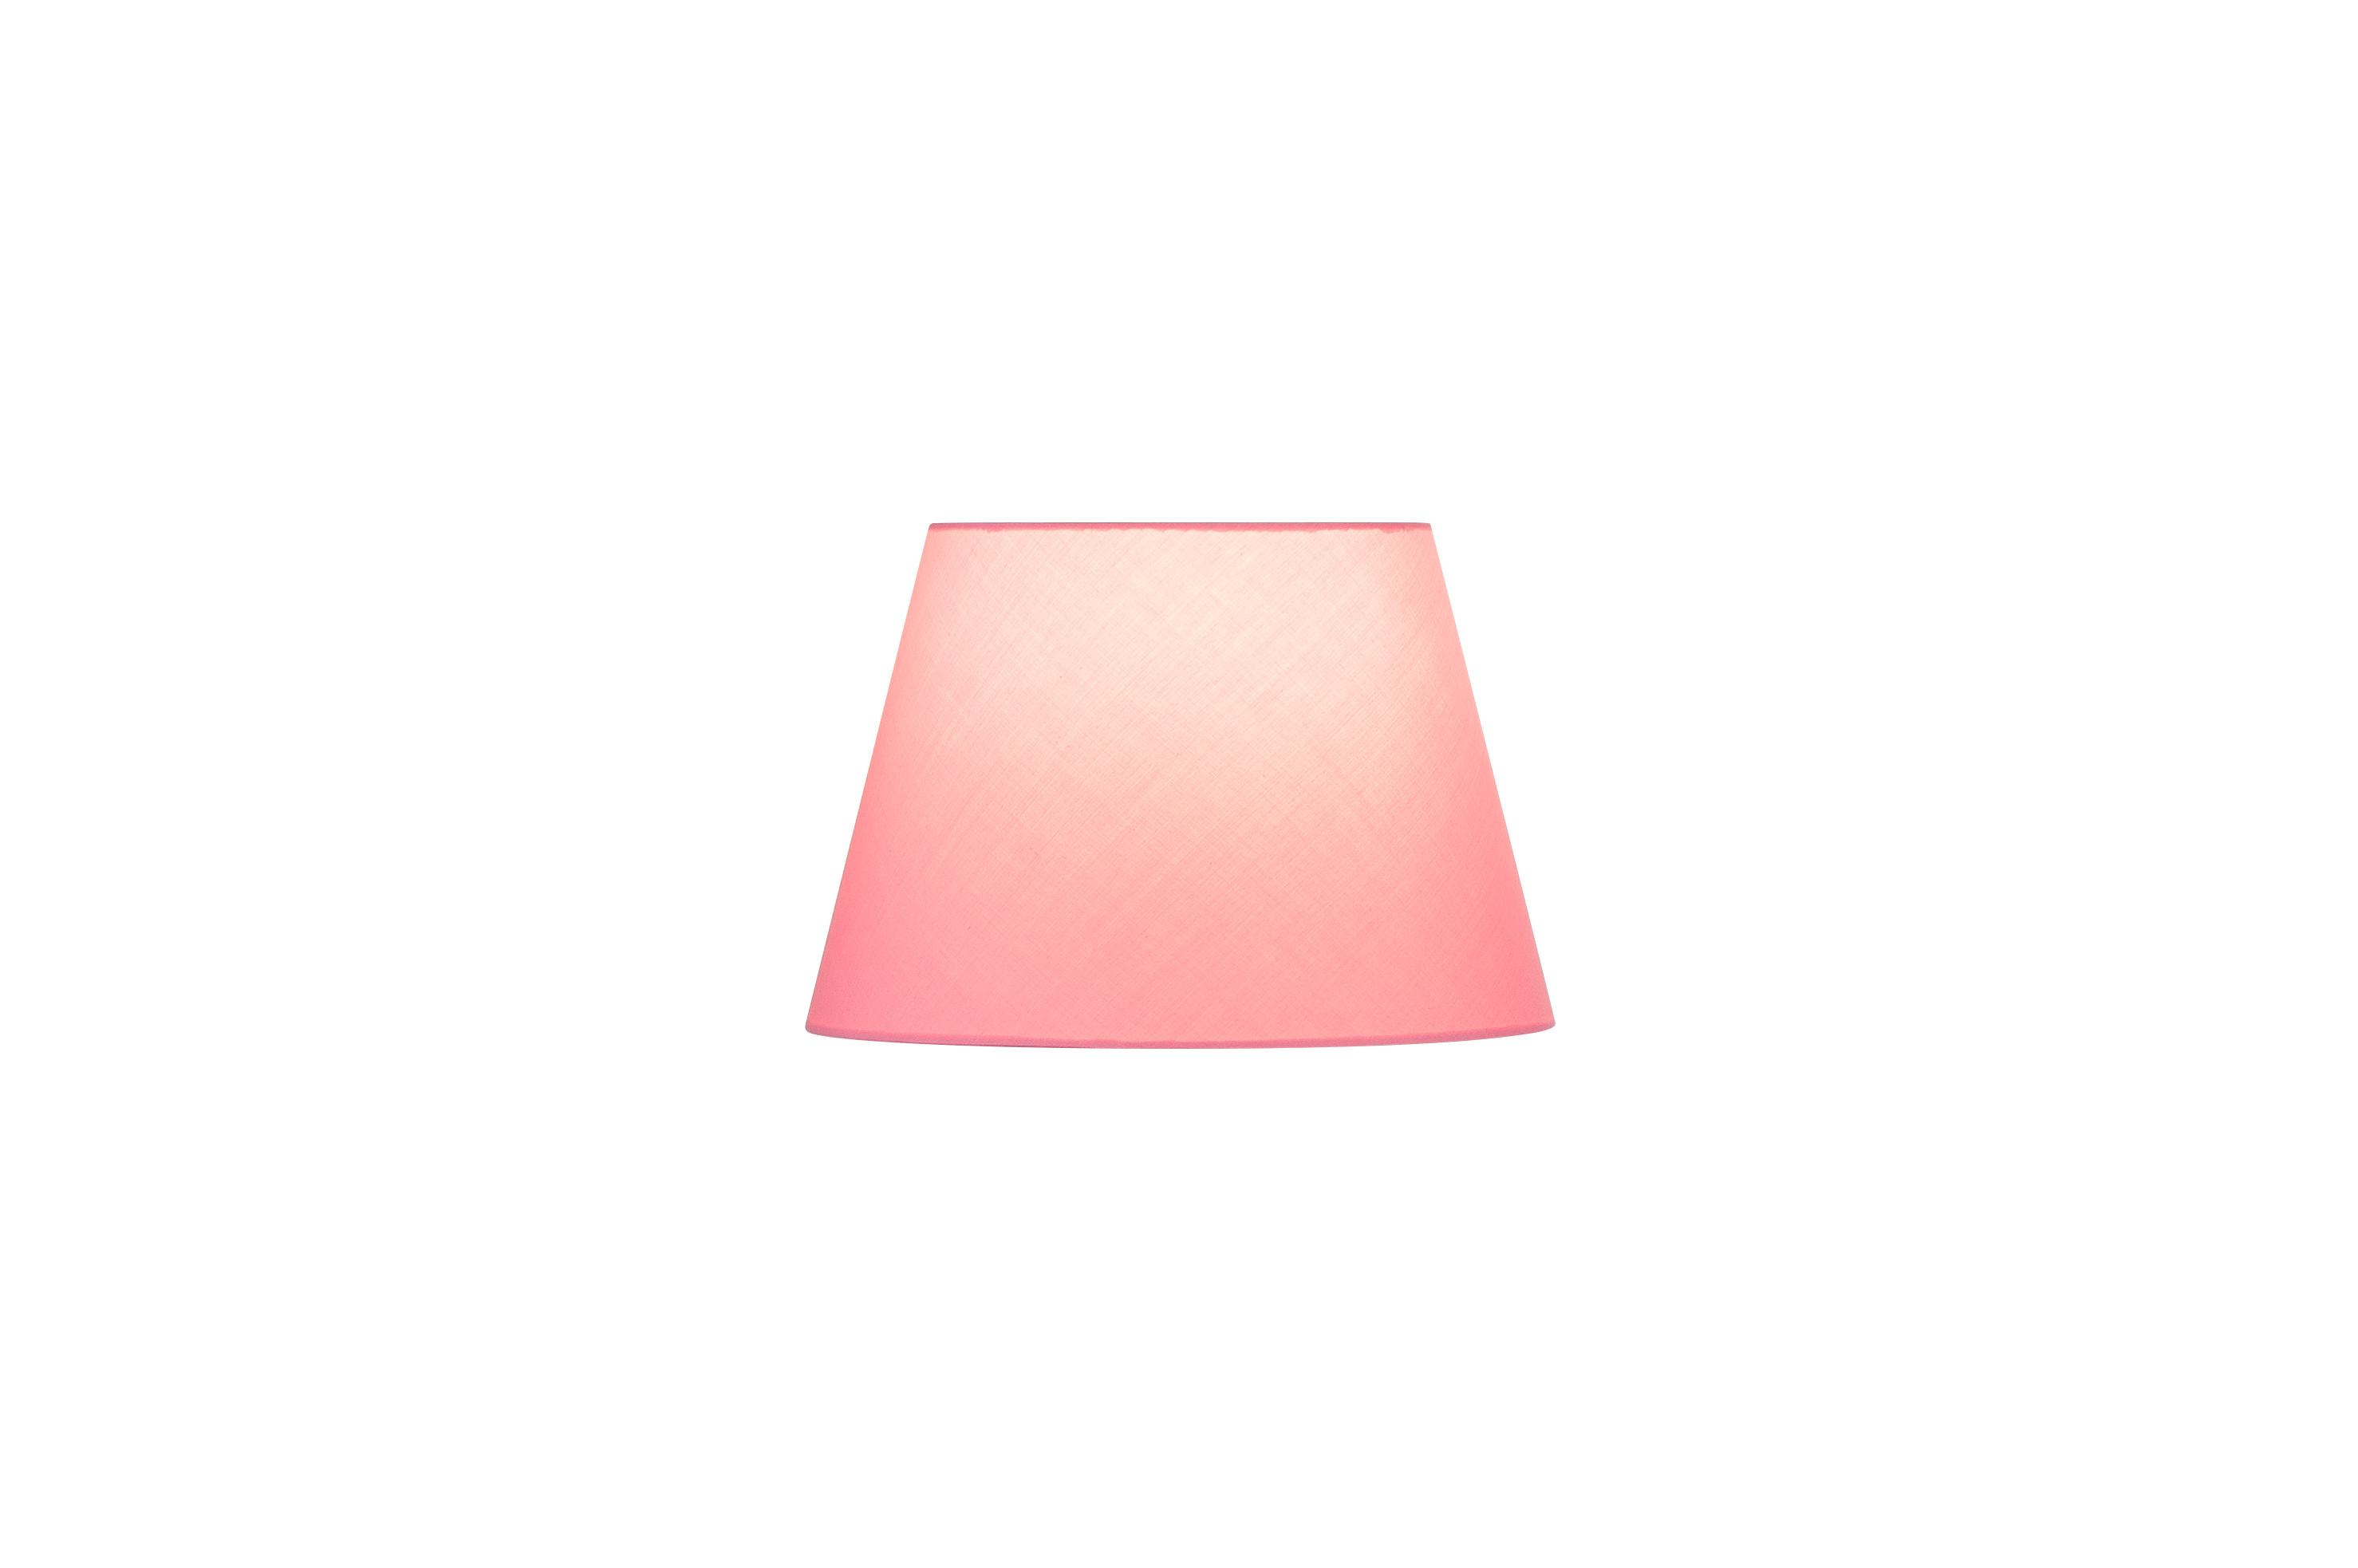 1 Stk FENDA, Leuchtenschirm, konisch, pink, Ø/H 30/20 cm LI156169--